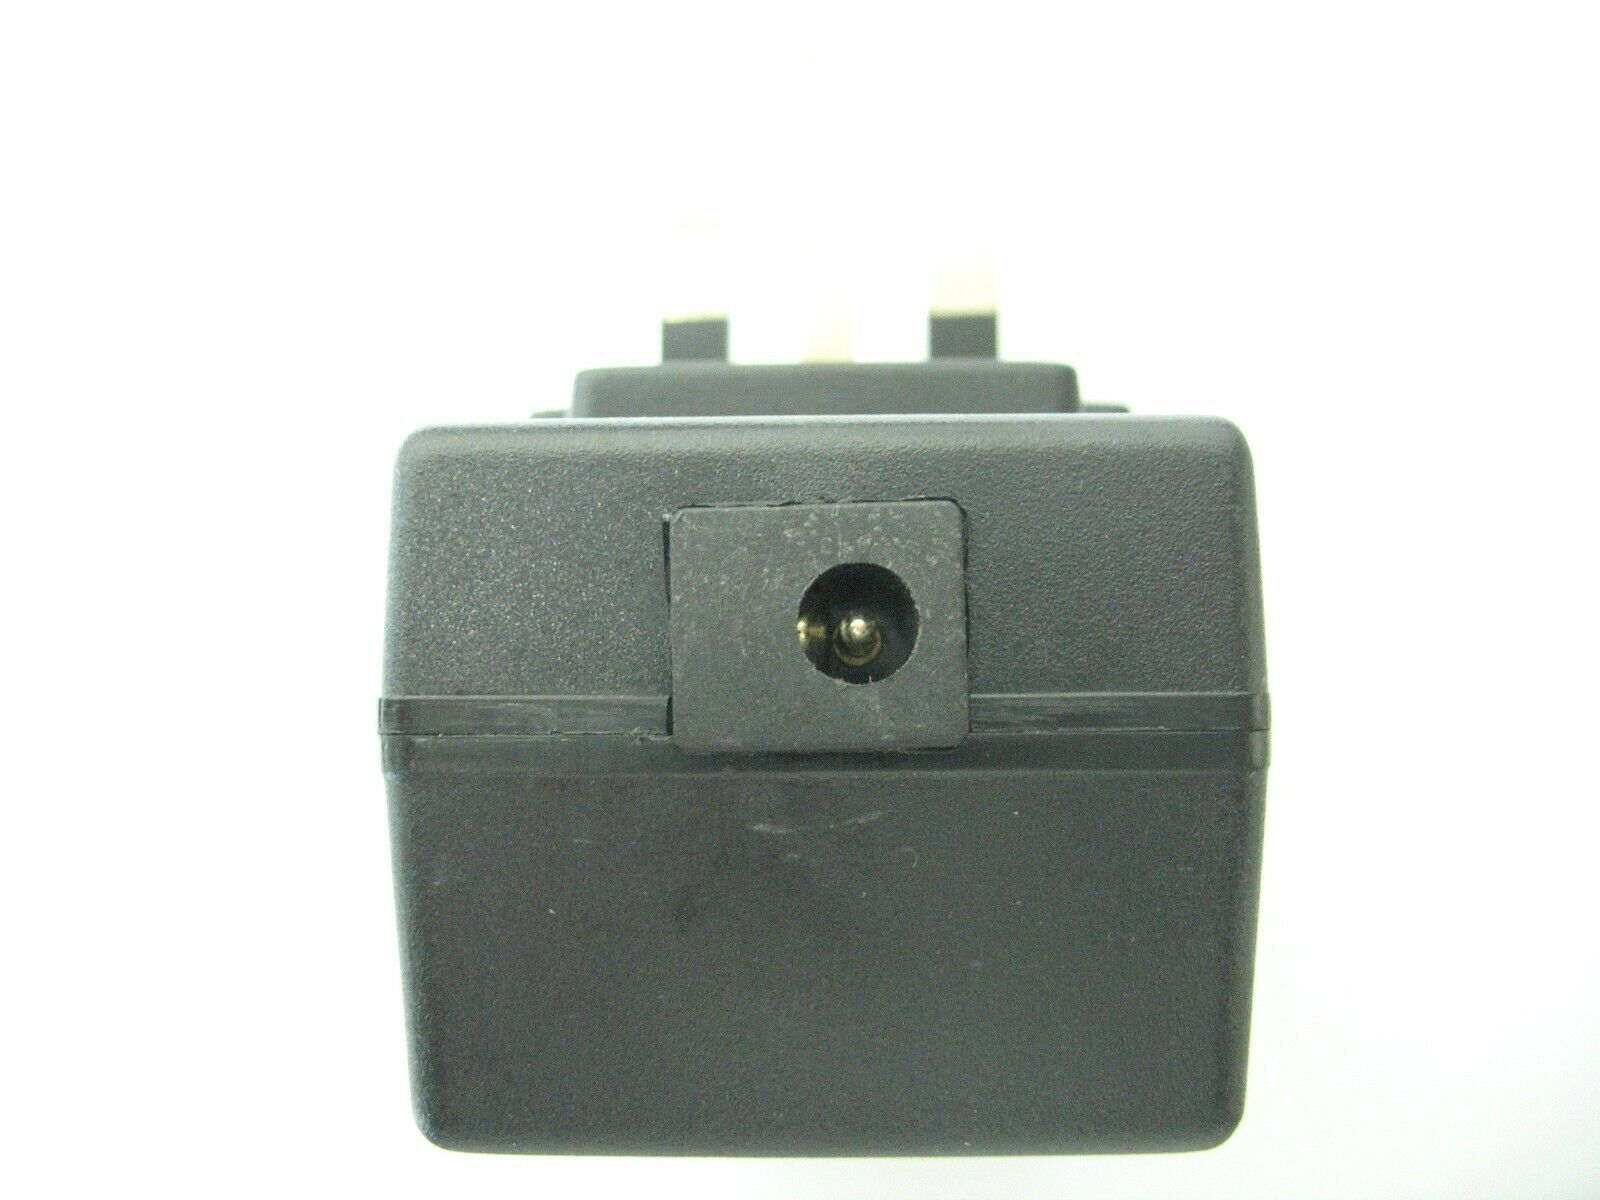 0.3 amp 24 volt Socket AC-DC (DC Output) Power Adaptor/Supply/Charger 7.2 watt